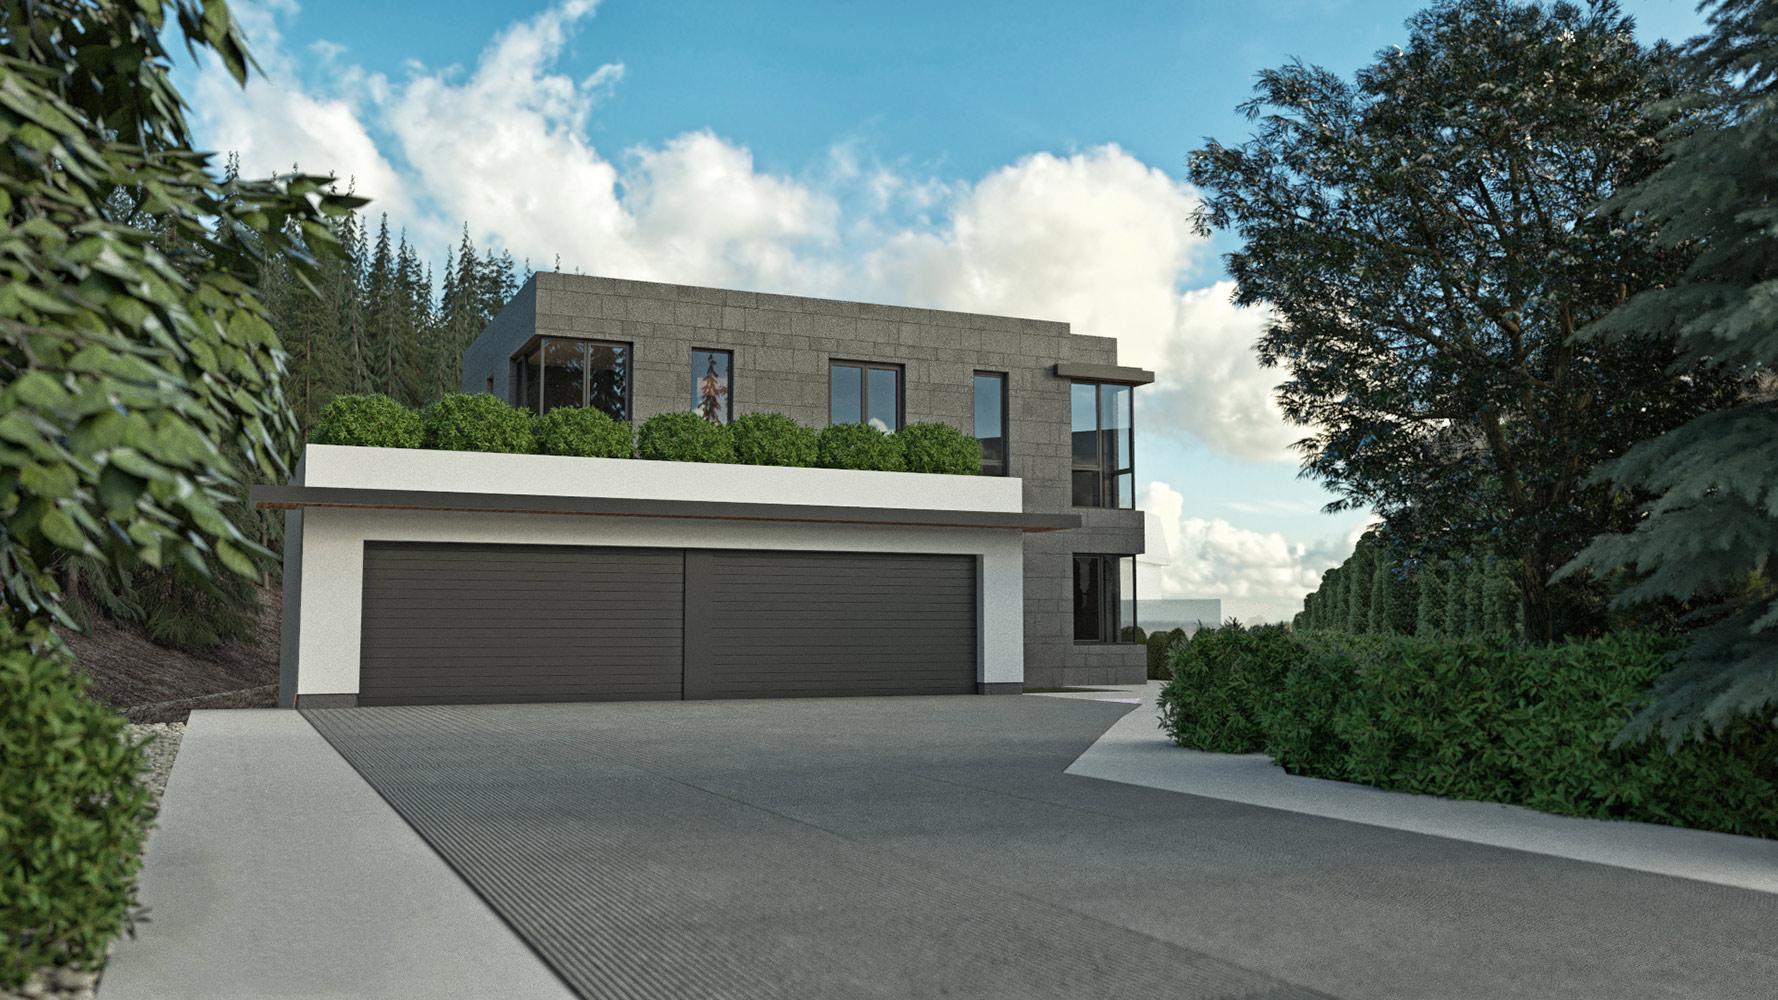 2016 Private Residence Sofia Exterior 7